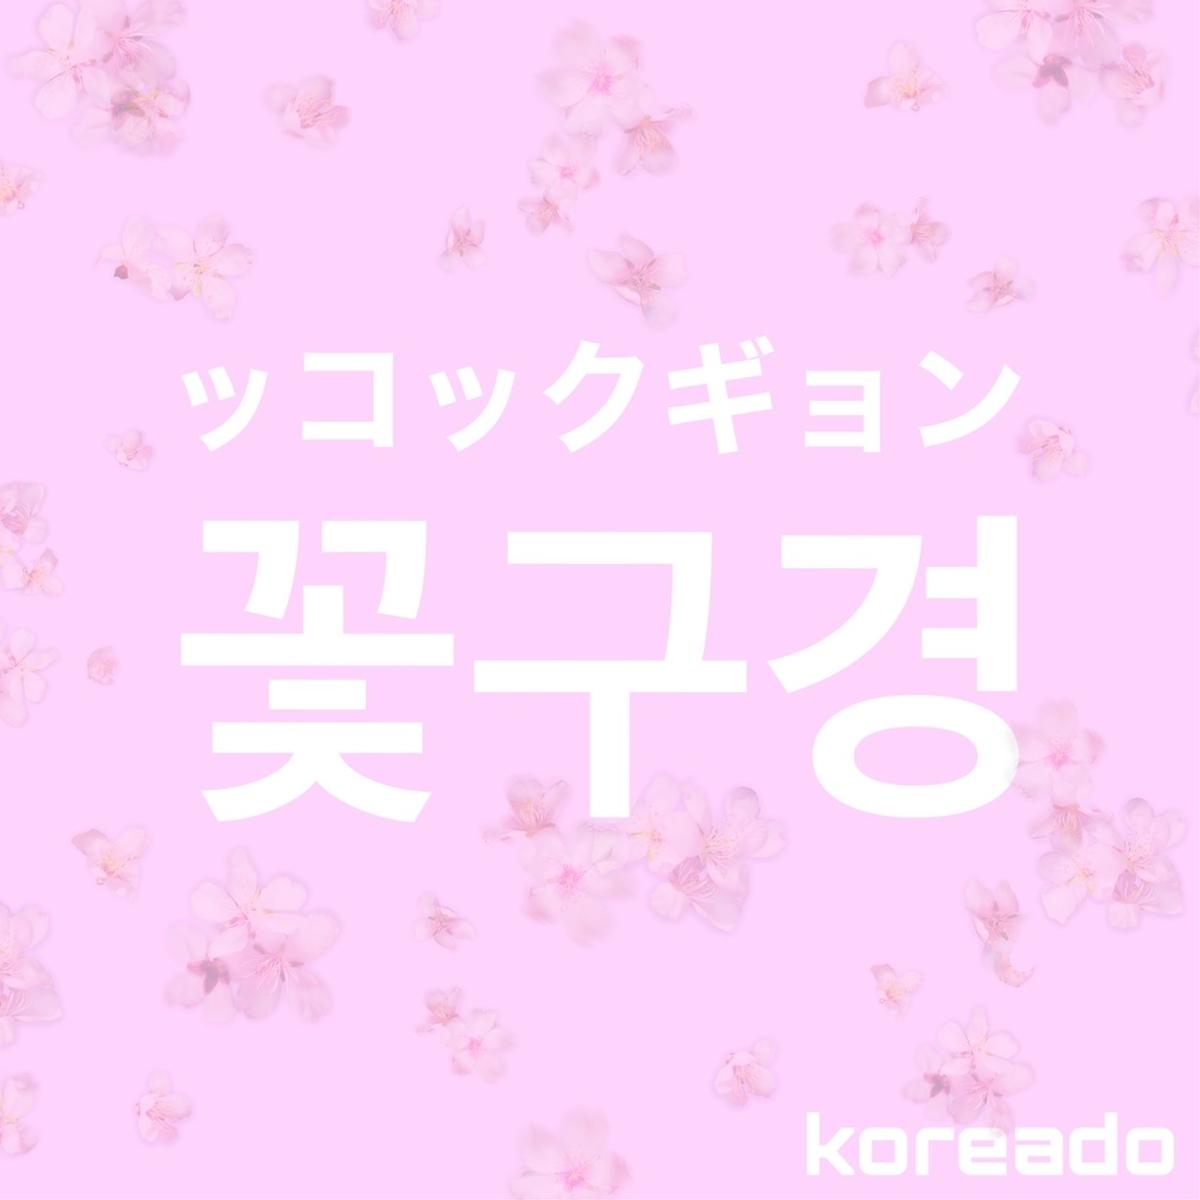 f:id:i-love-korea:20200416210638j:plain